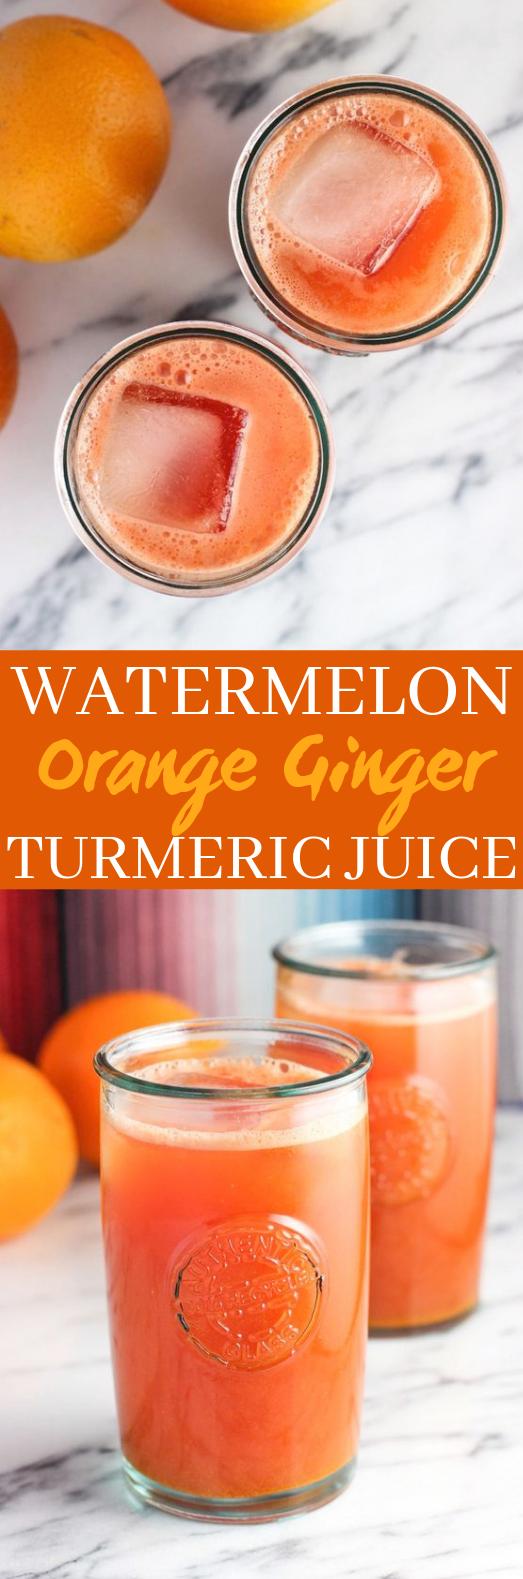 Watermelon Orange Ginger Turmeric Juice #healthy #drinks